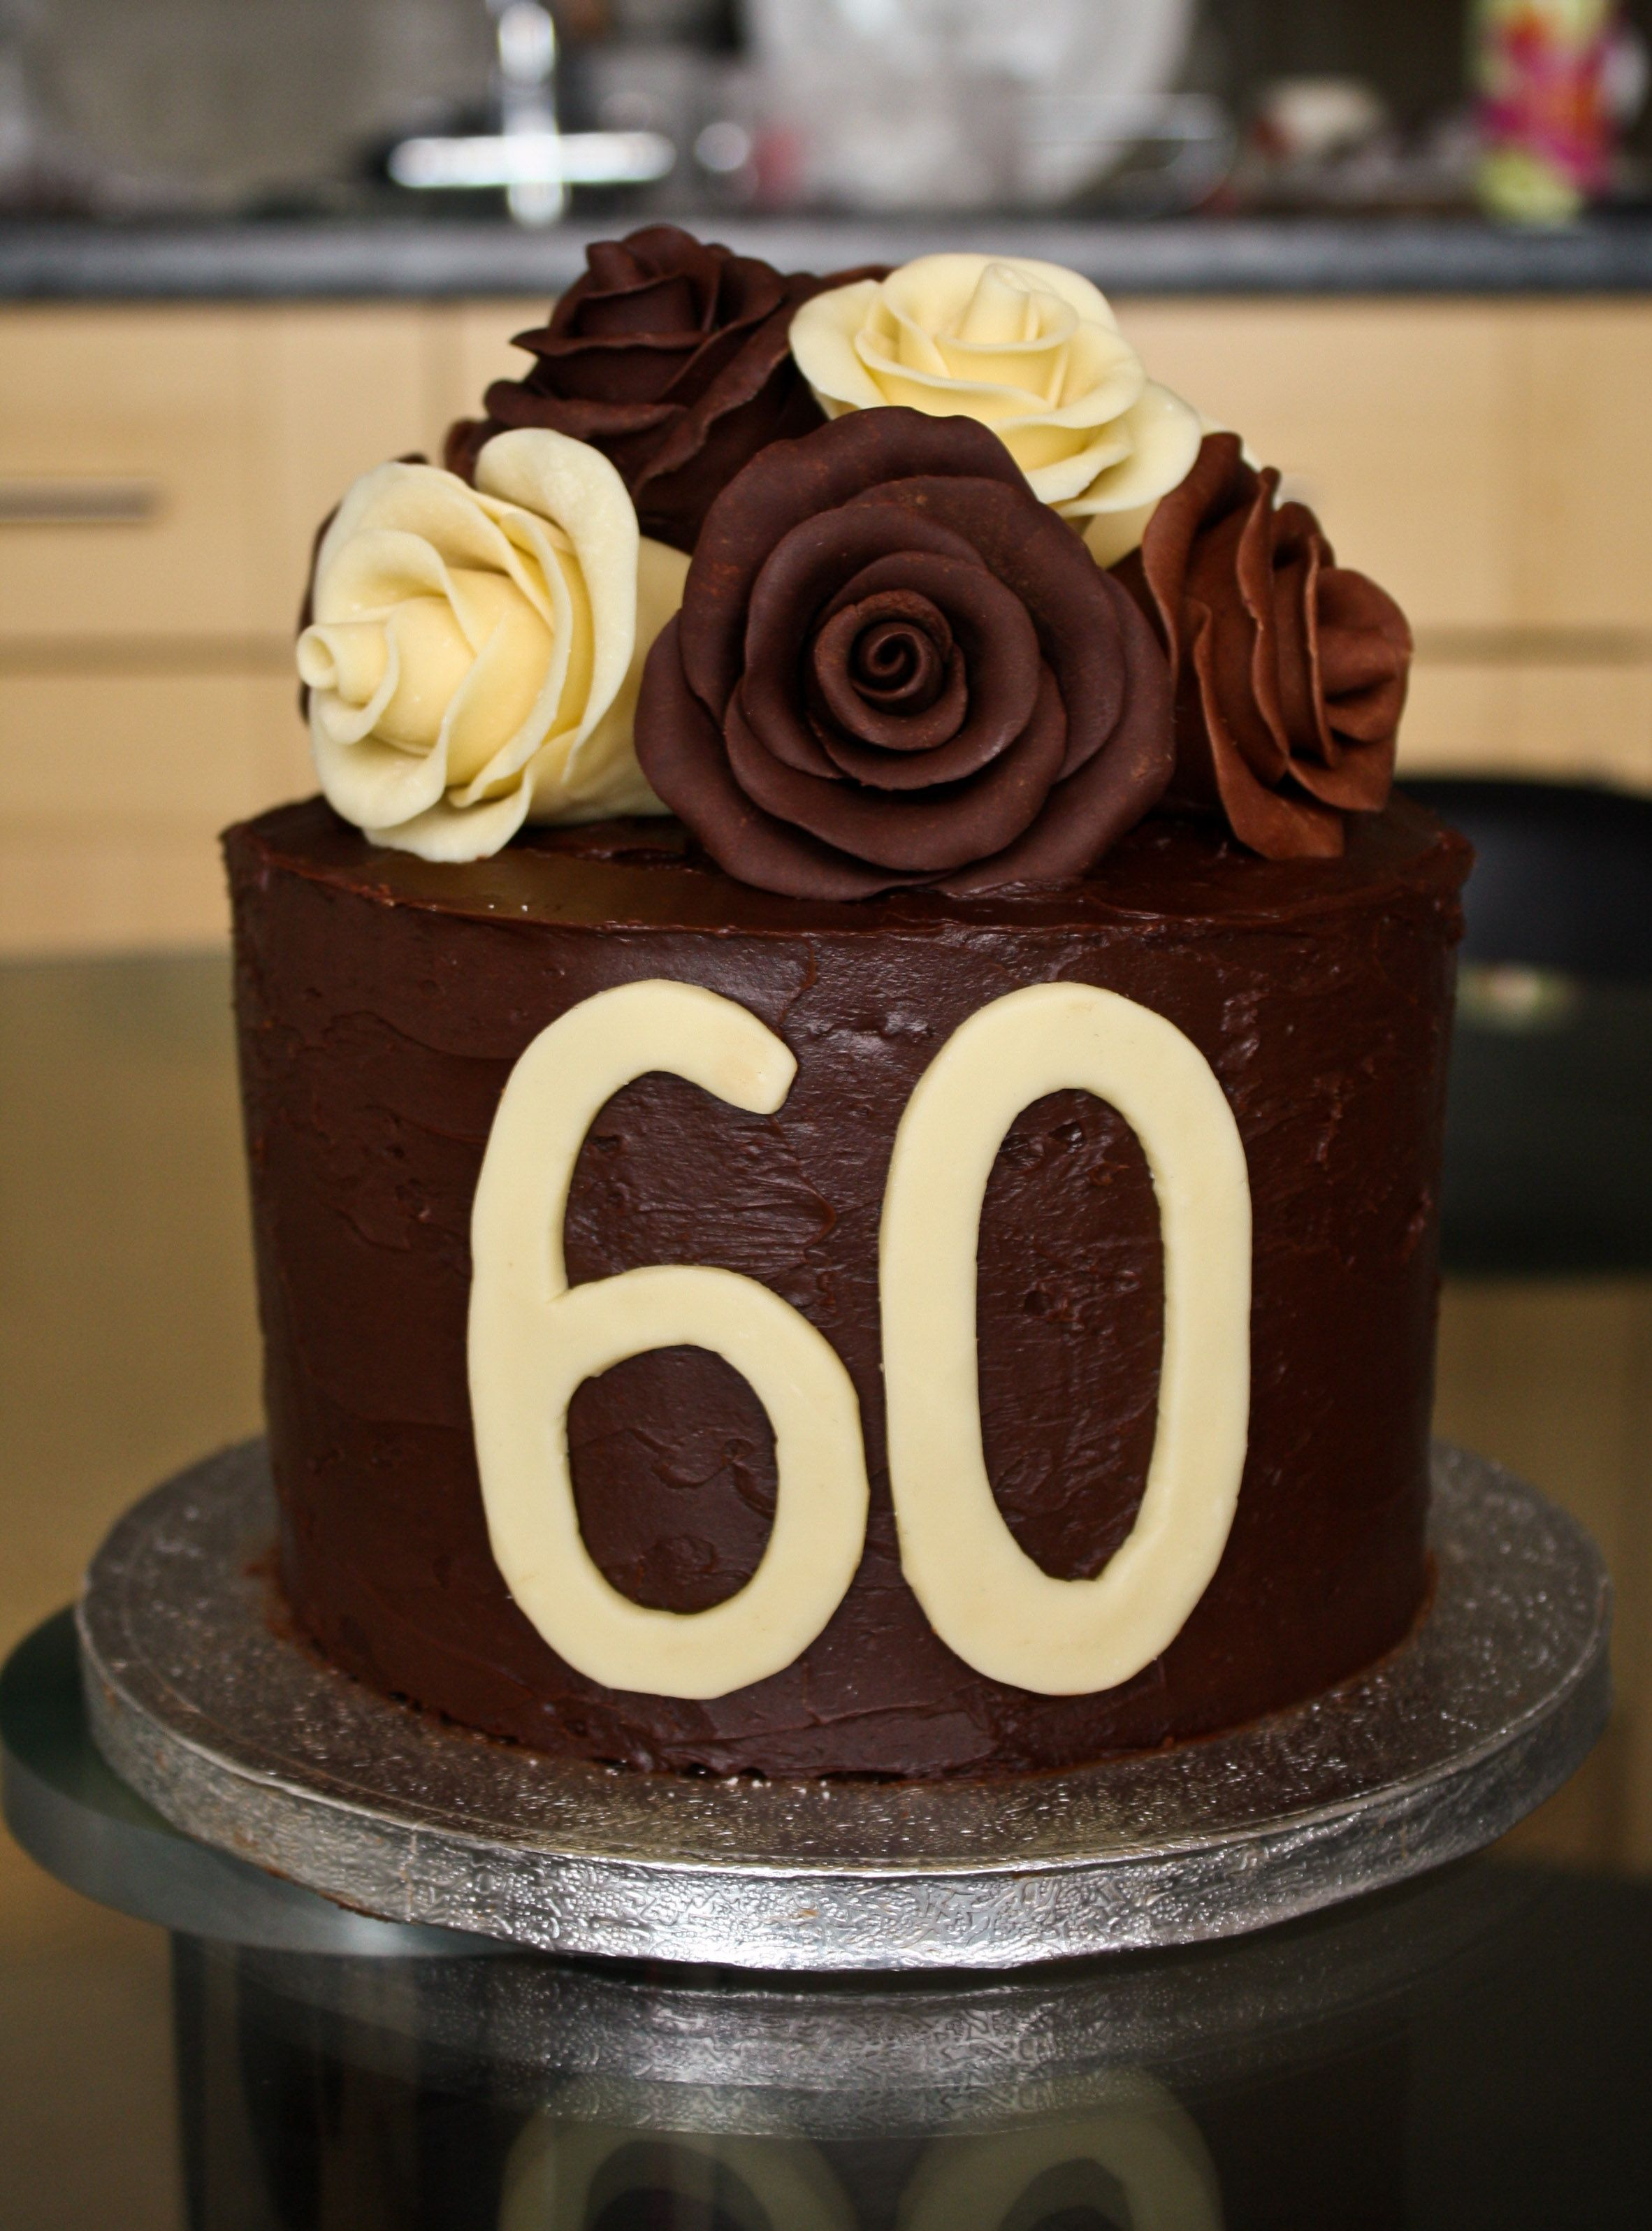 Chocolate Roses Birthday Cake | Birthday sheet cakes ...